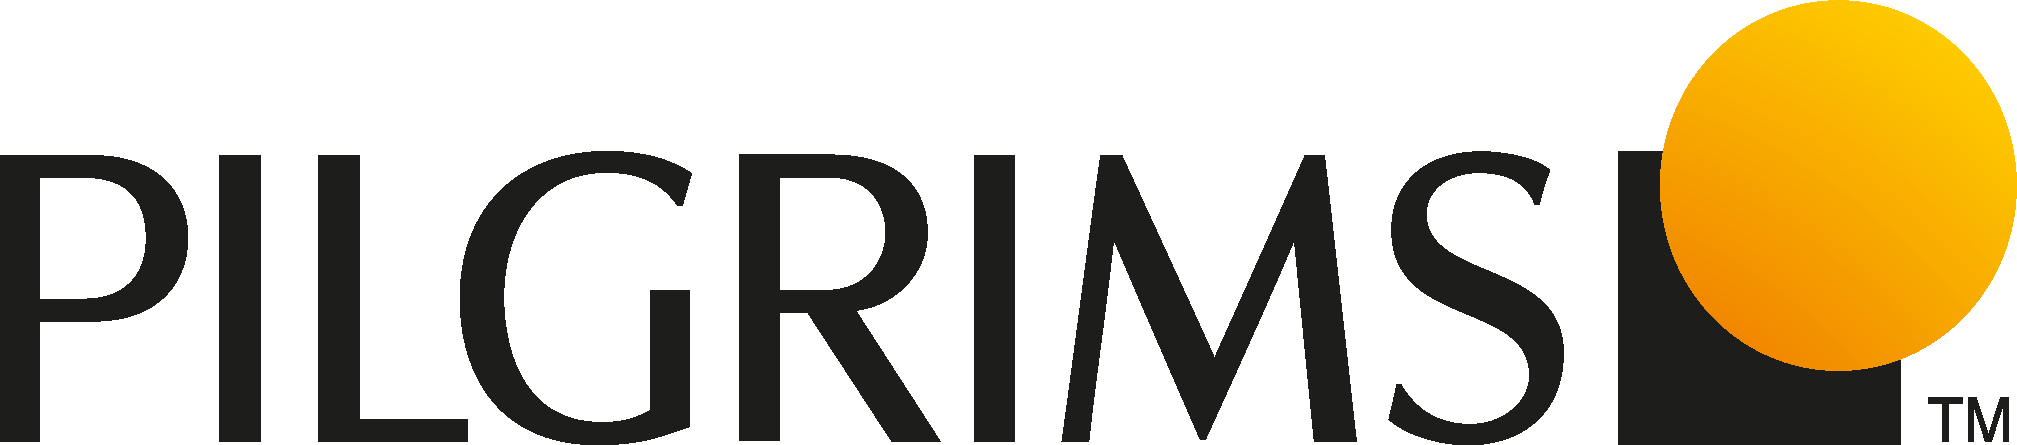 Pilgrims Risk Management Group Global Operations